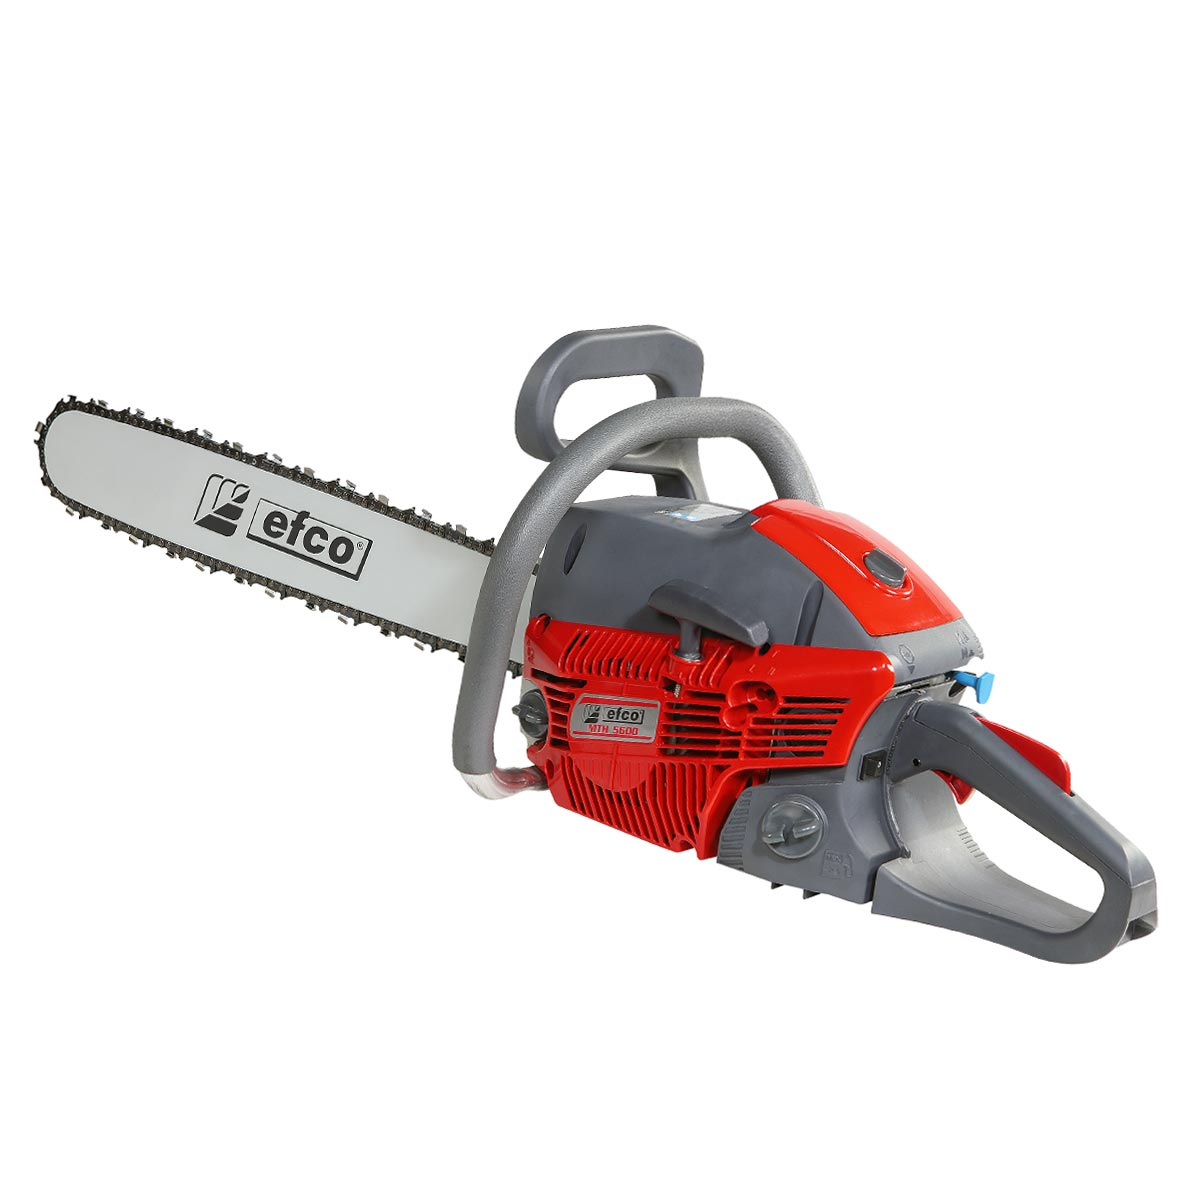 MTH 560 / MTH 5600: H series medium power chainsaws - Efco